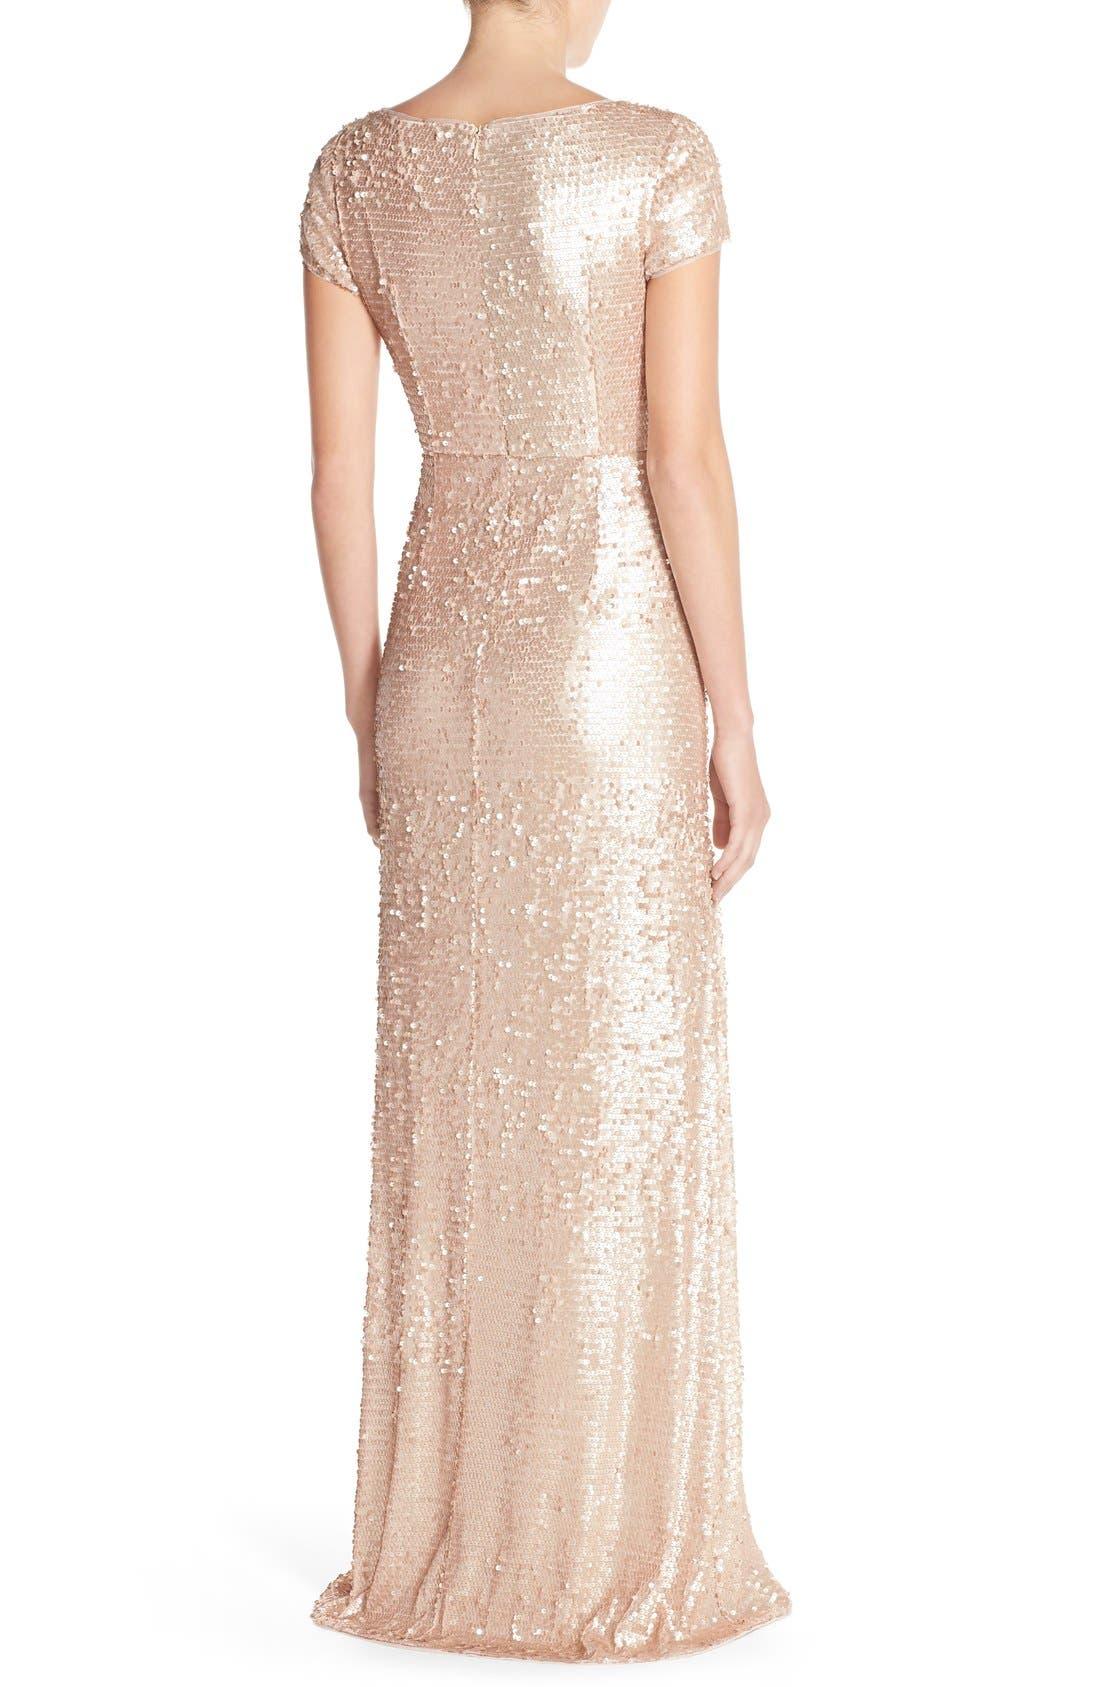 Sequin Mesh A-Line Gown,                             Alternate thumbnail 2, color,                             221